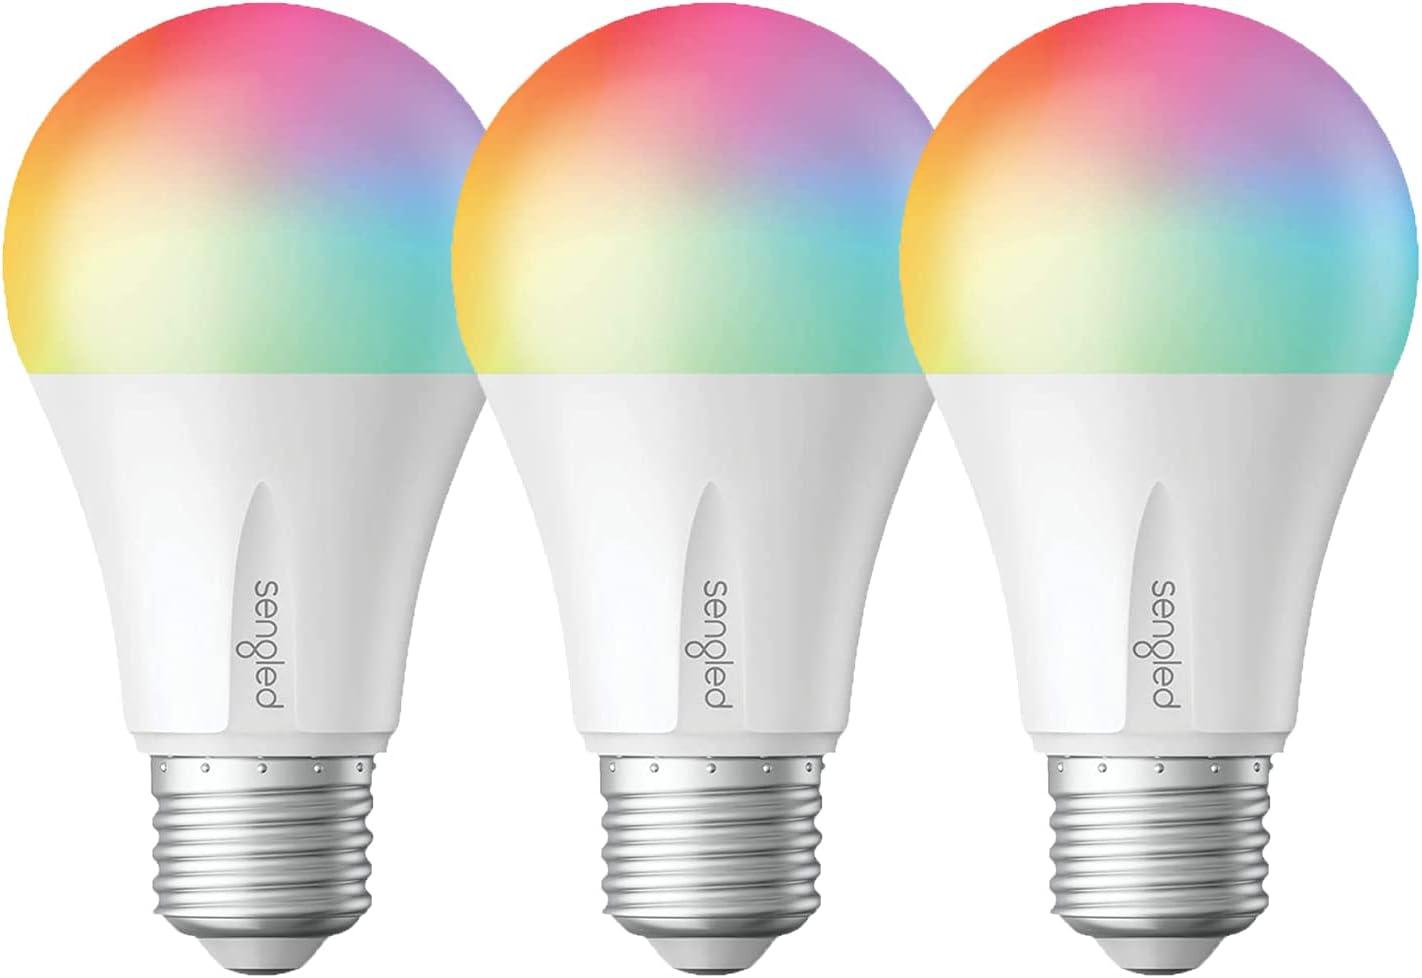 Sengled Smart Bulb, Led Light Bulbs Color Changing, E26 Led Bulb 60 Watt, Smart Light Bulbs That Work with Alexa, Google Home, A19 Smart Bulb, Smart Hub Required, 800LM, 3 Pack